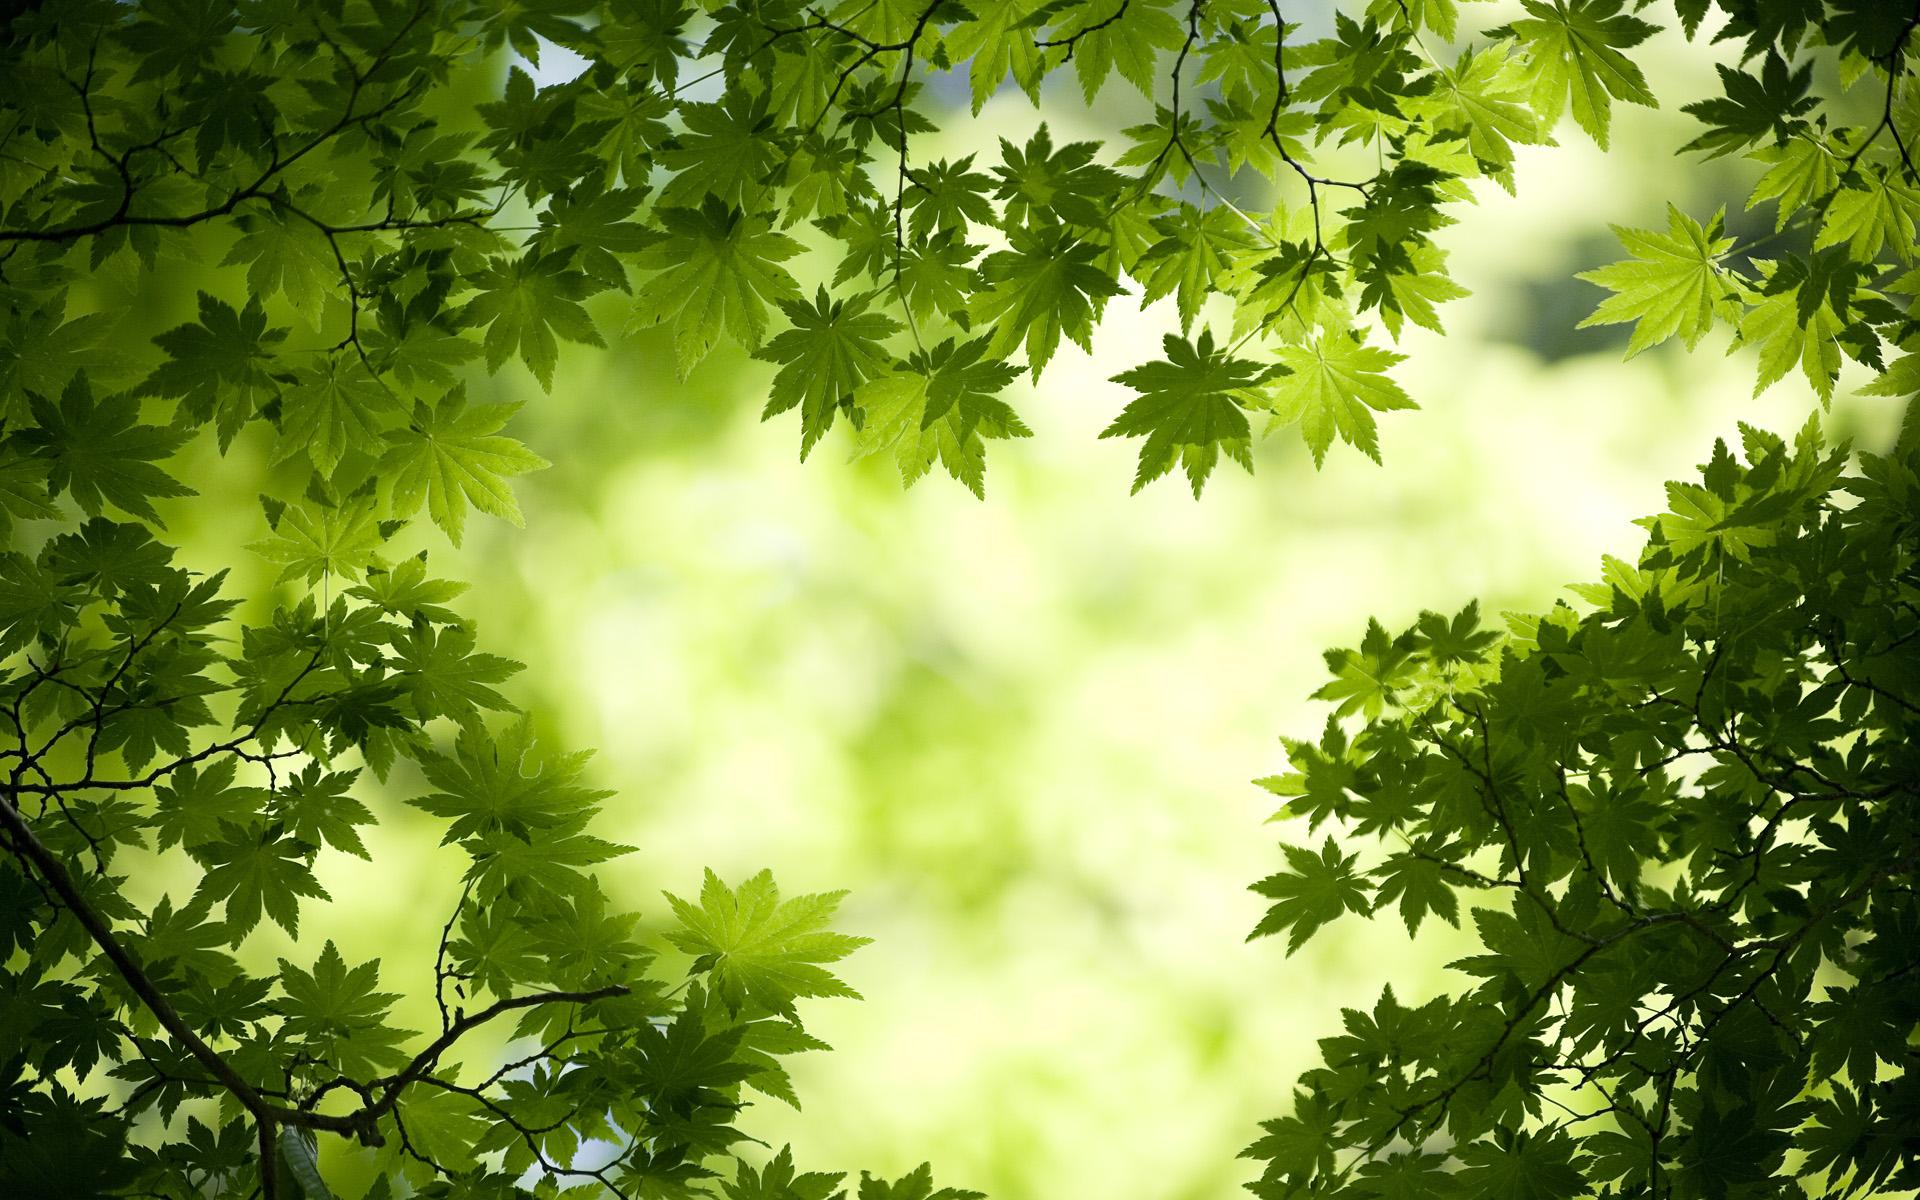 Top Wallpaper High Resolution Green - Green-Leaves-Wallpaper-For-PC  HD_738334.jpg